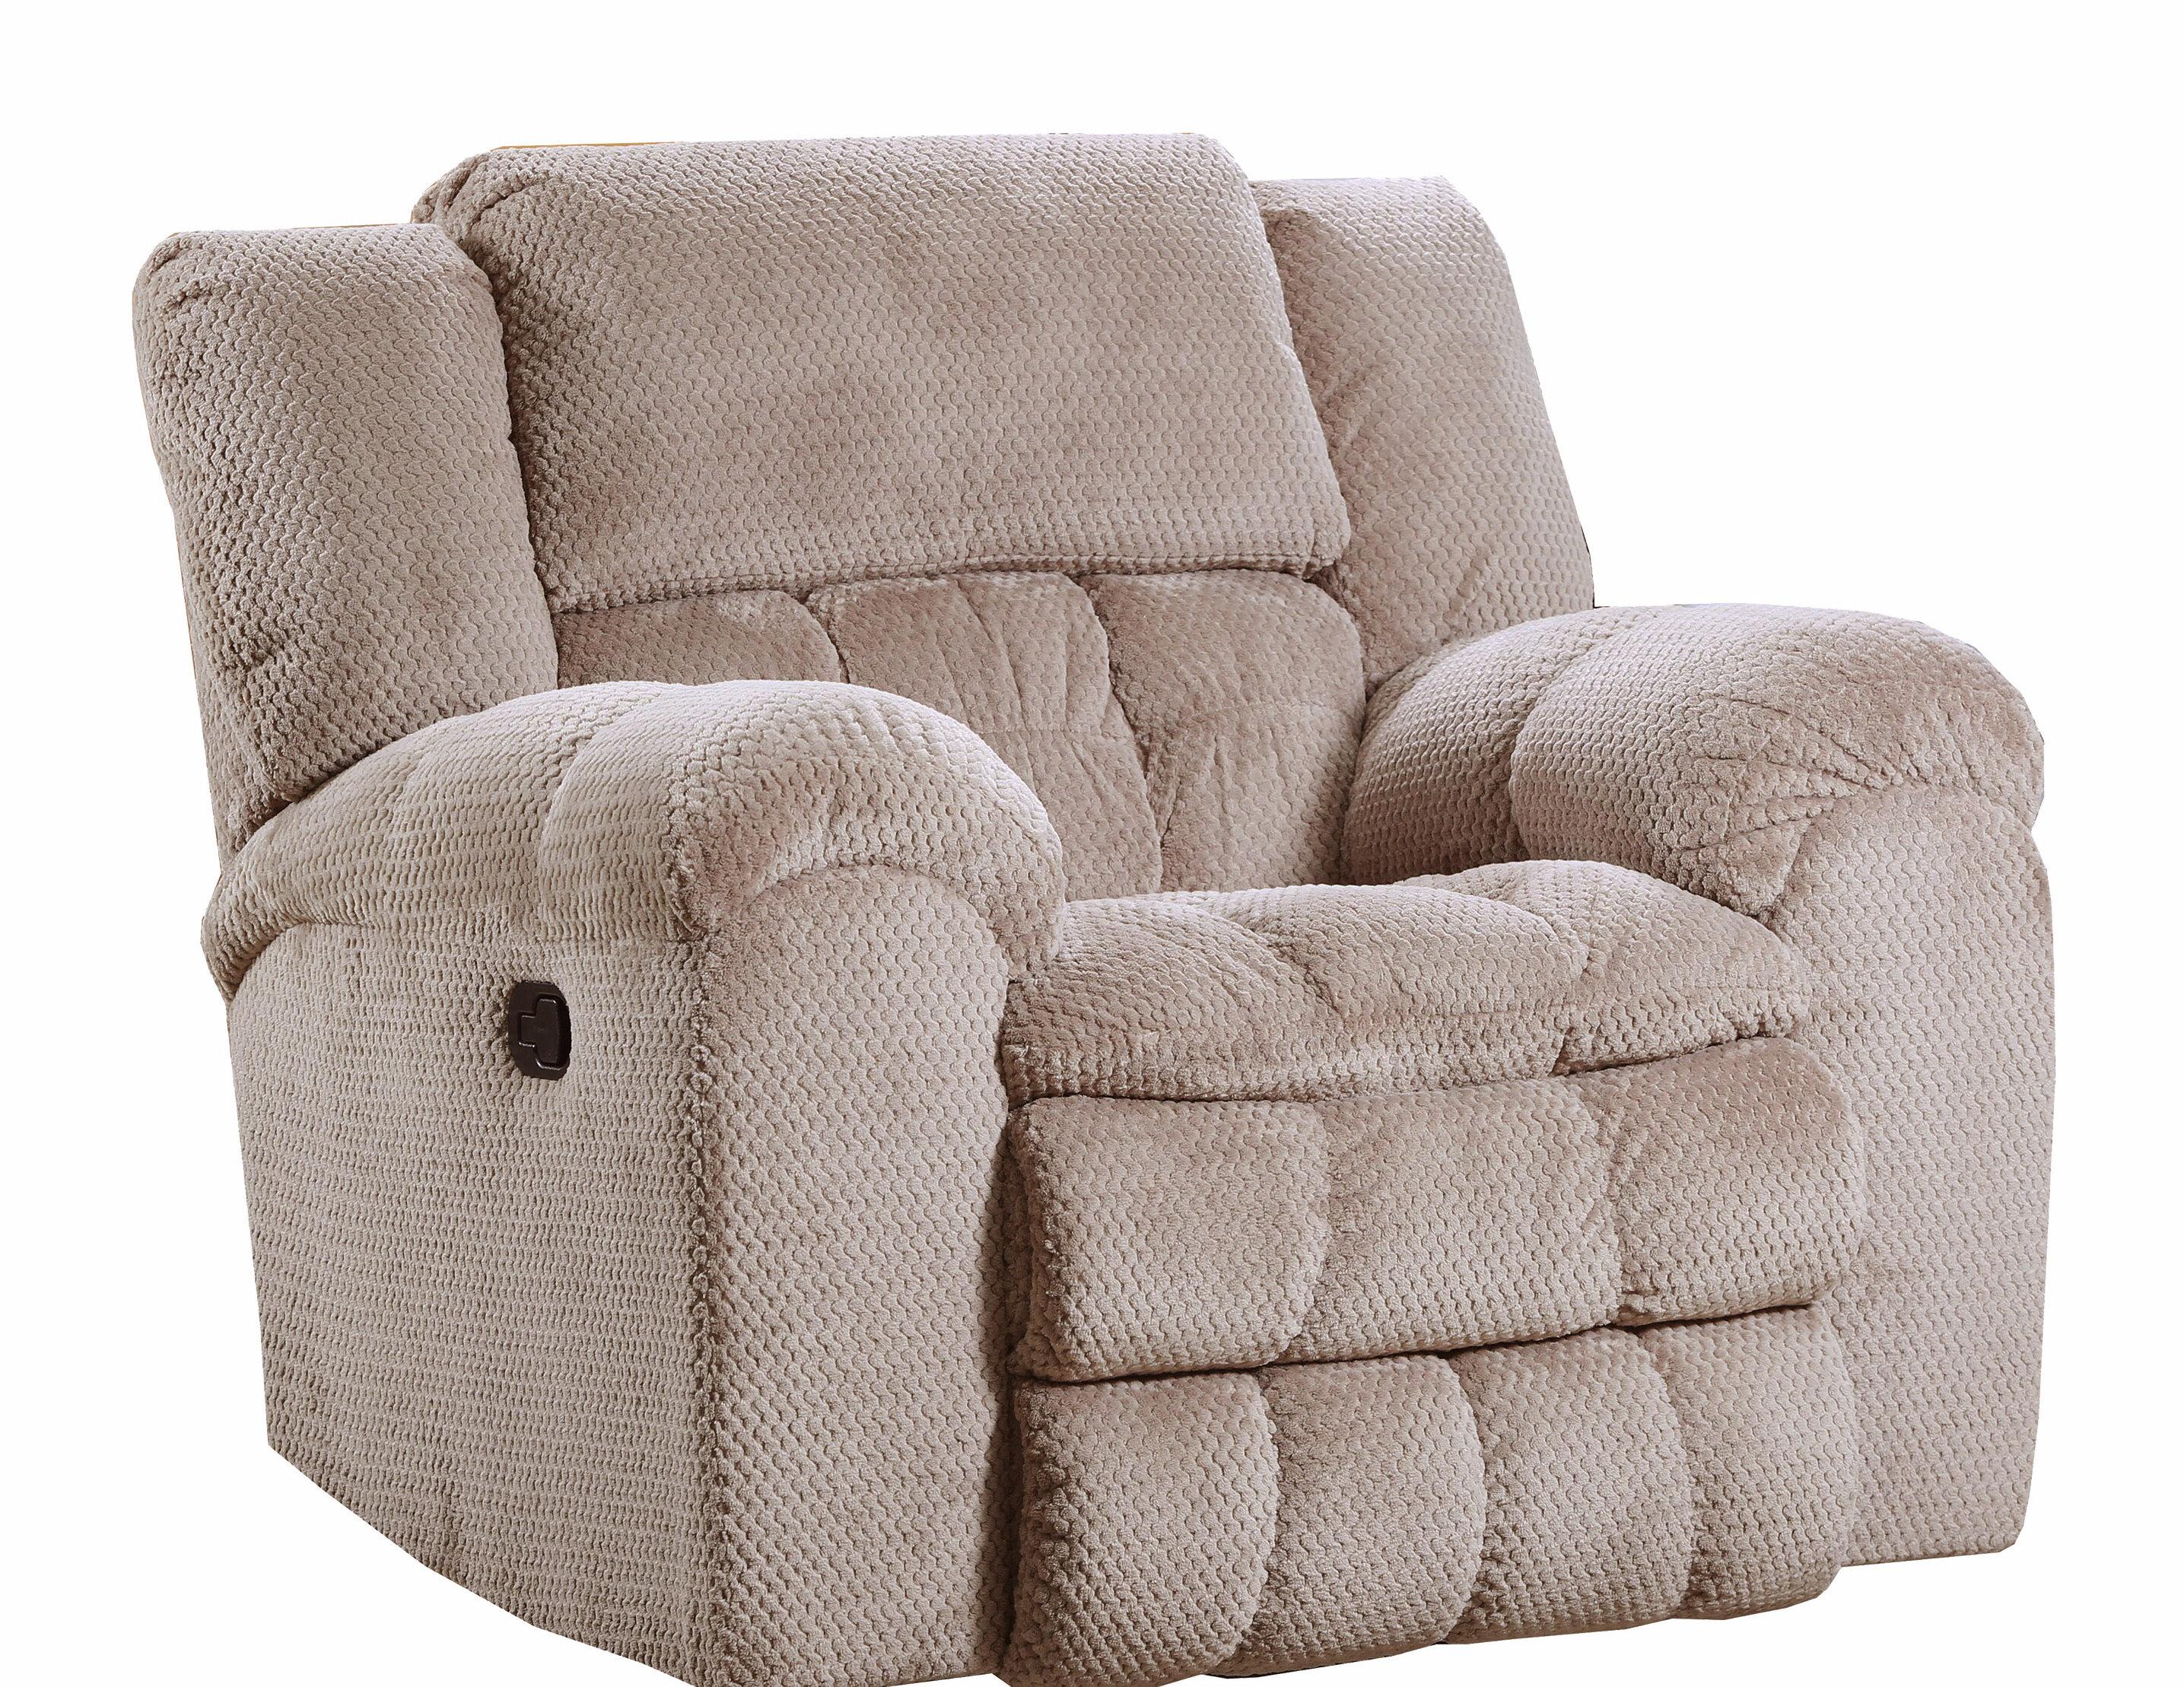 Pleasing Henning Fabric Rocker Recliner By Simmons Upholstery Machost Co Dining Chair Design Ideas Machostcouk